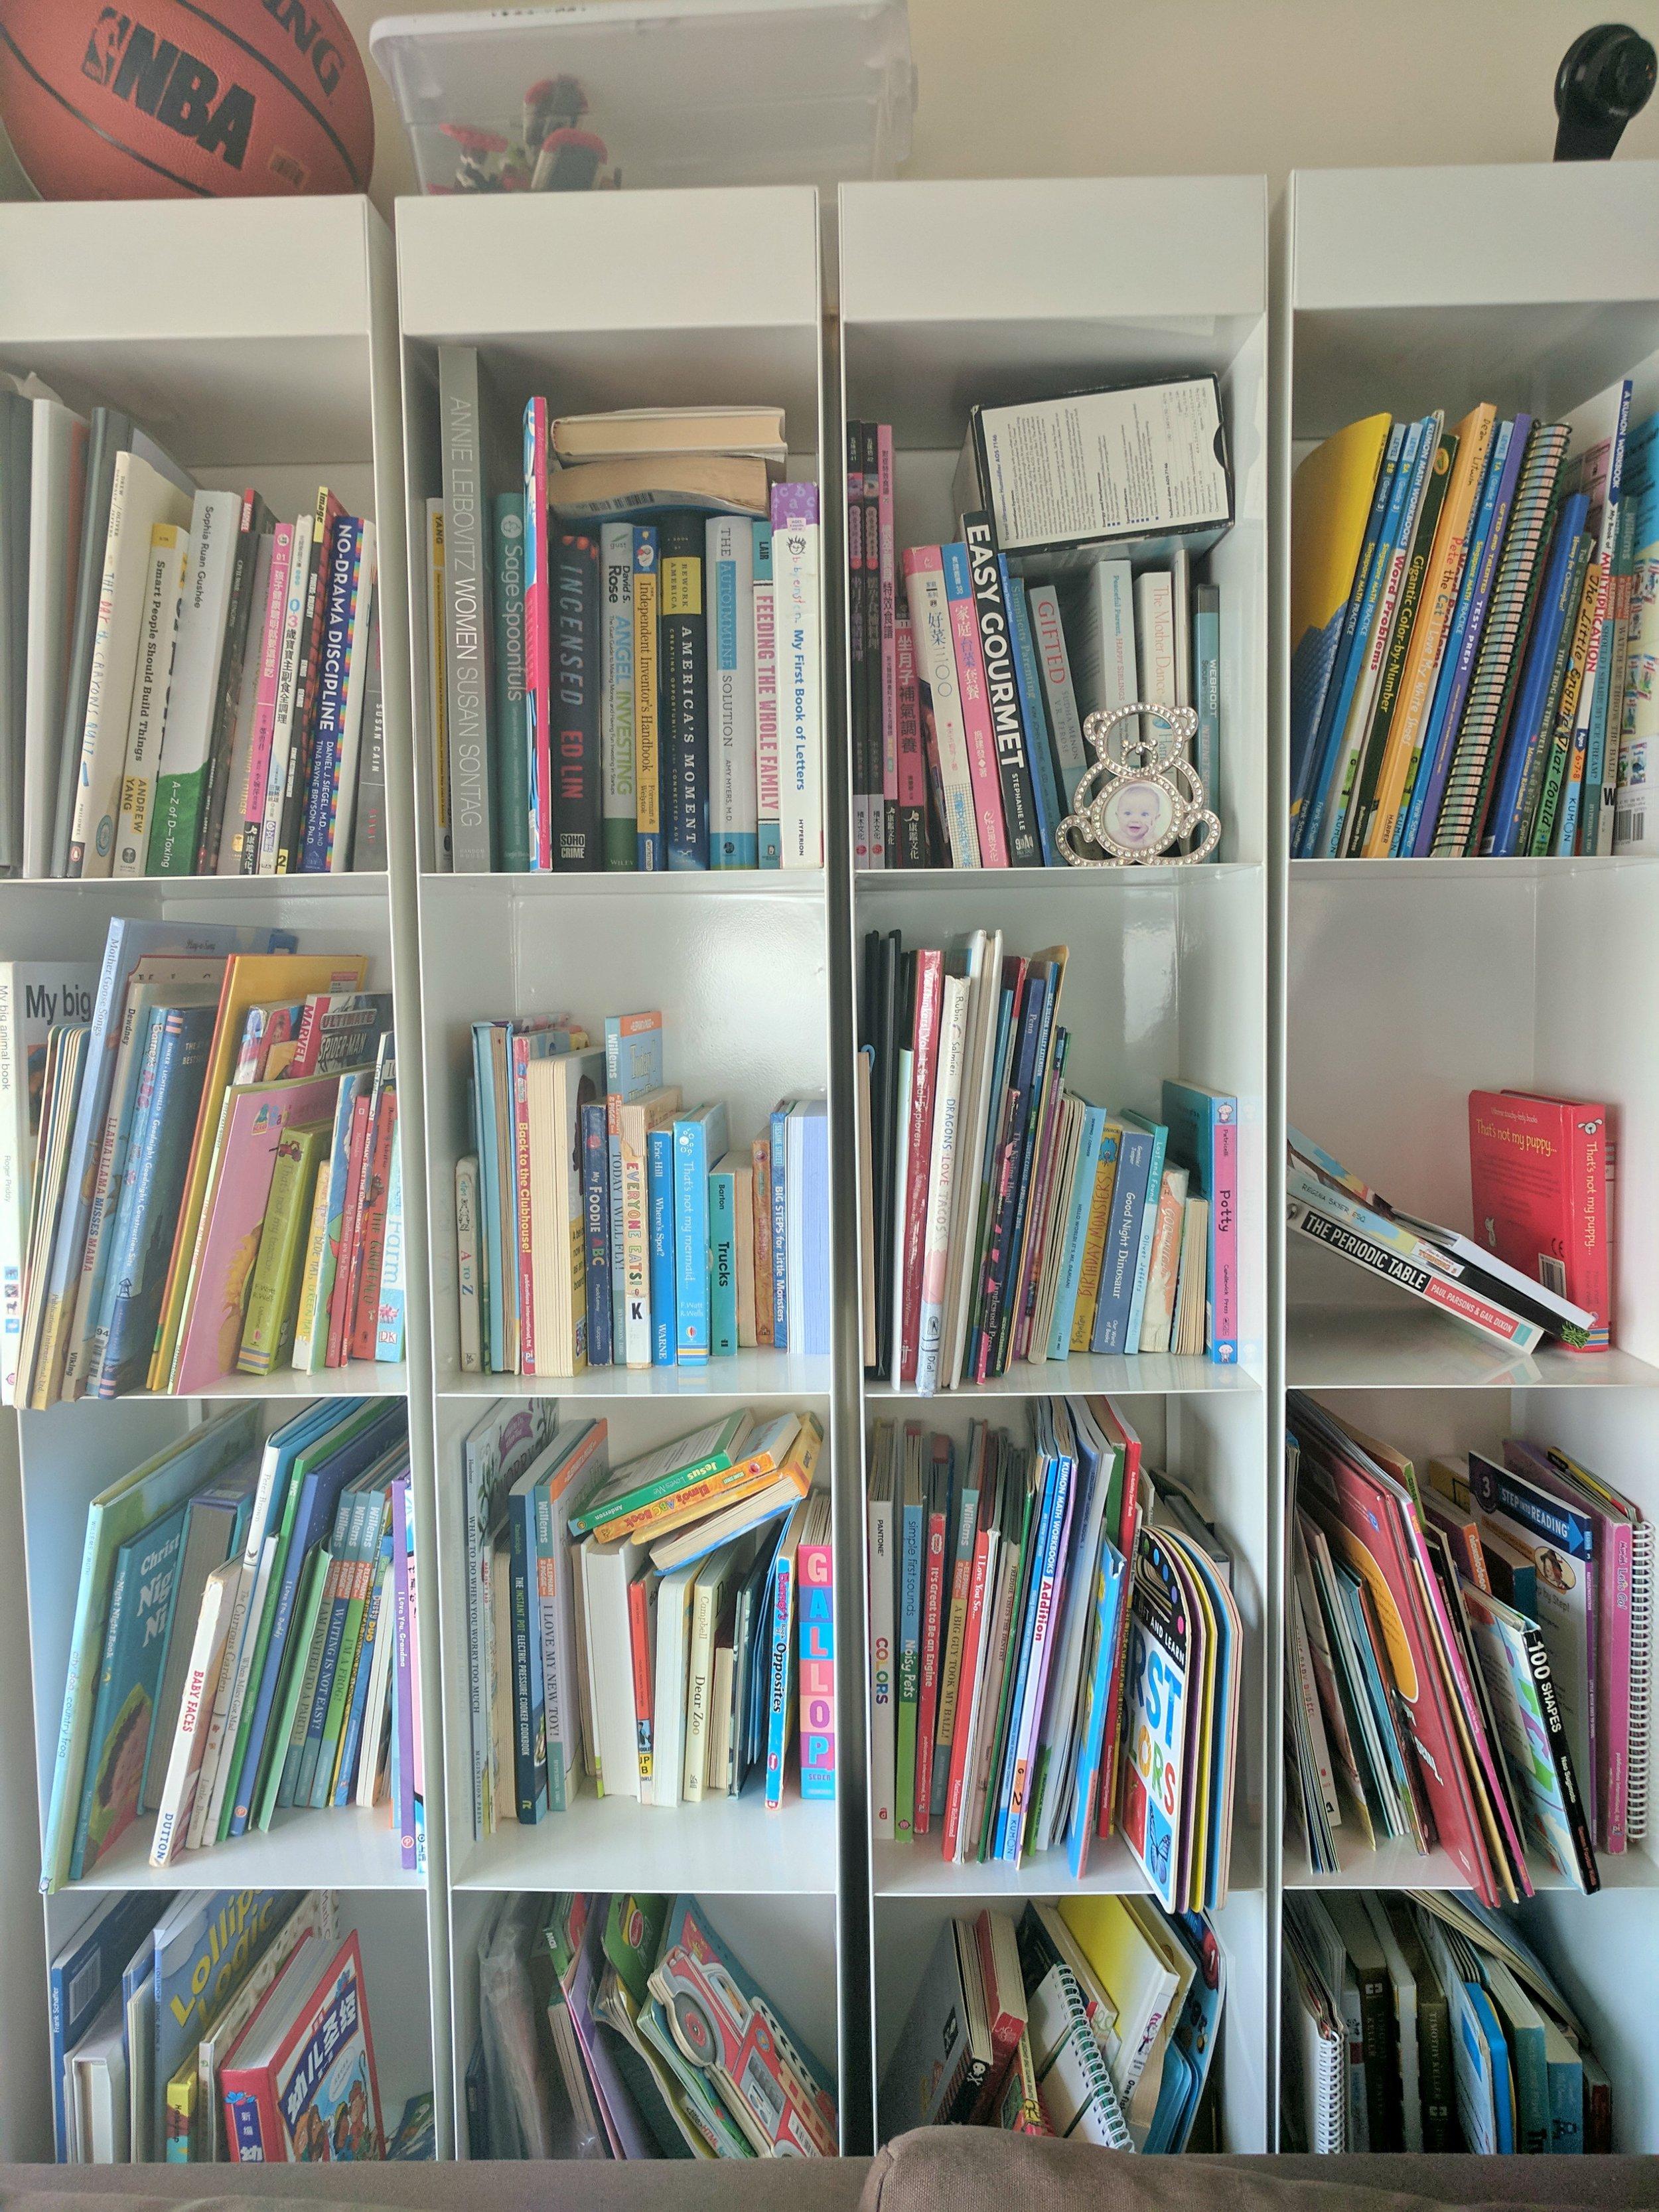 Disorganized jumble of books